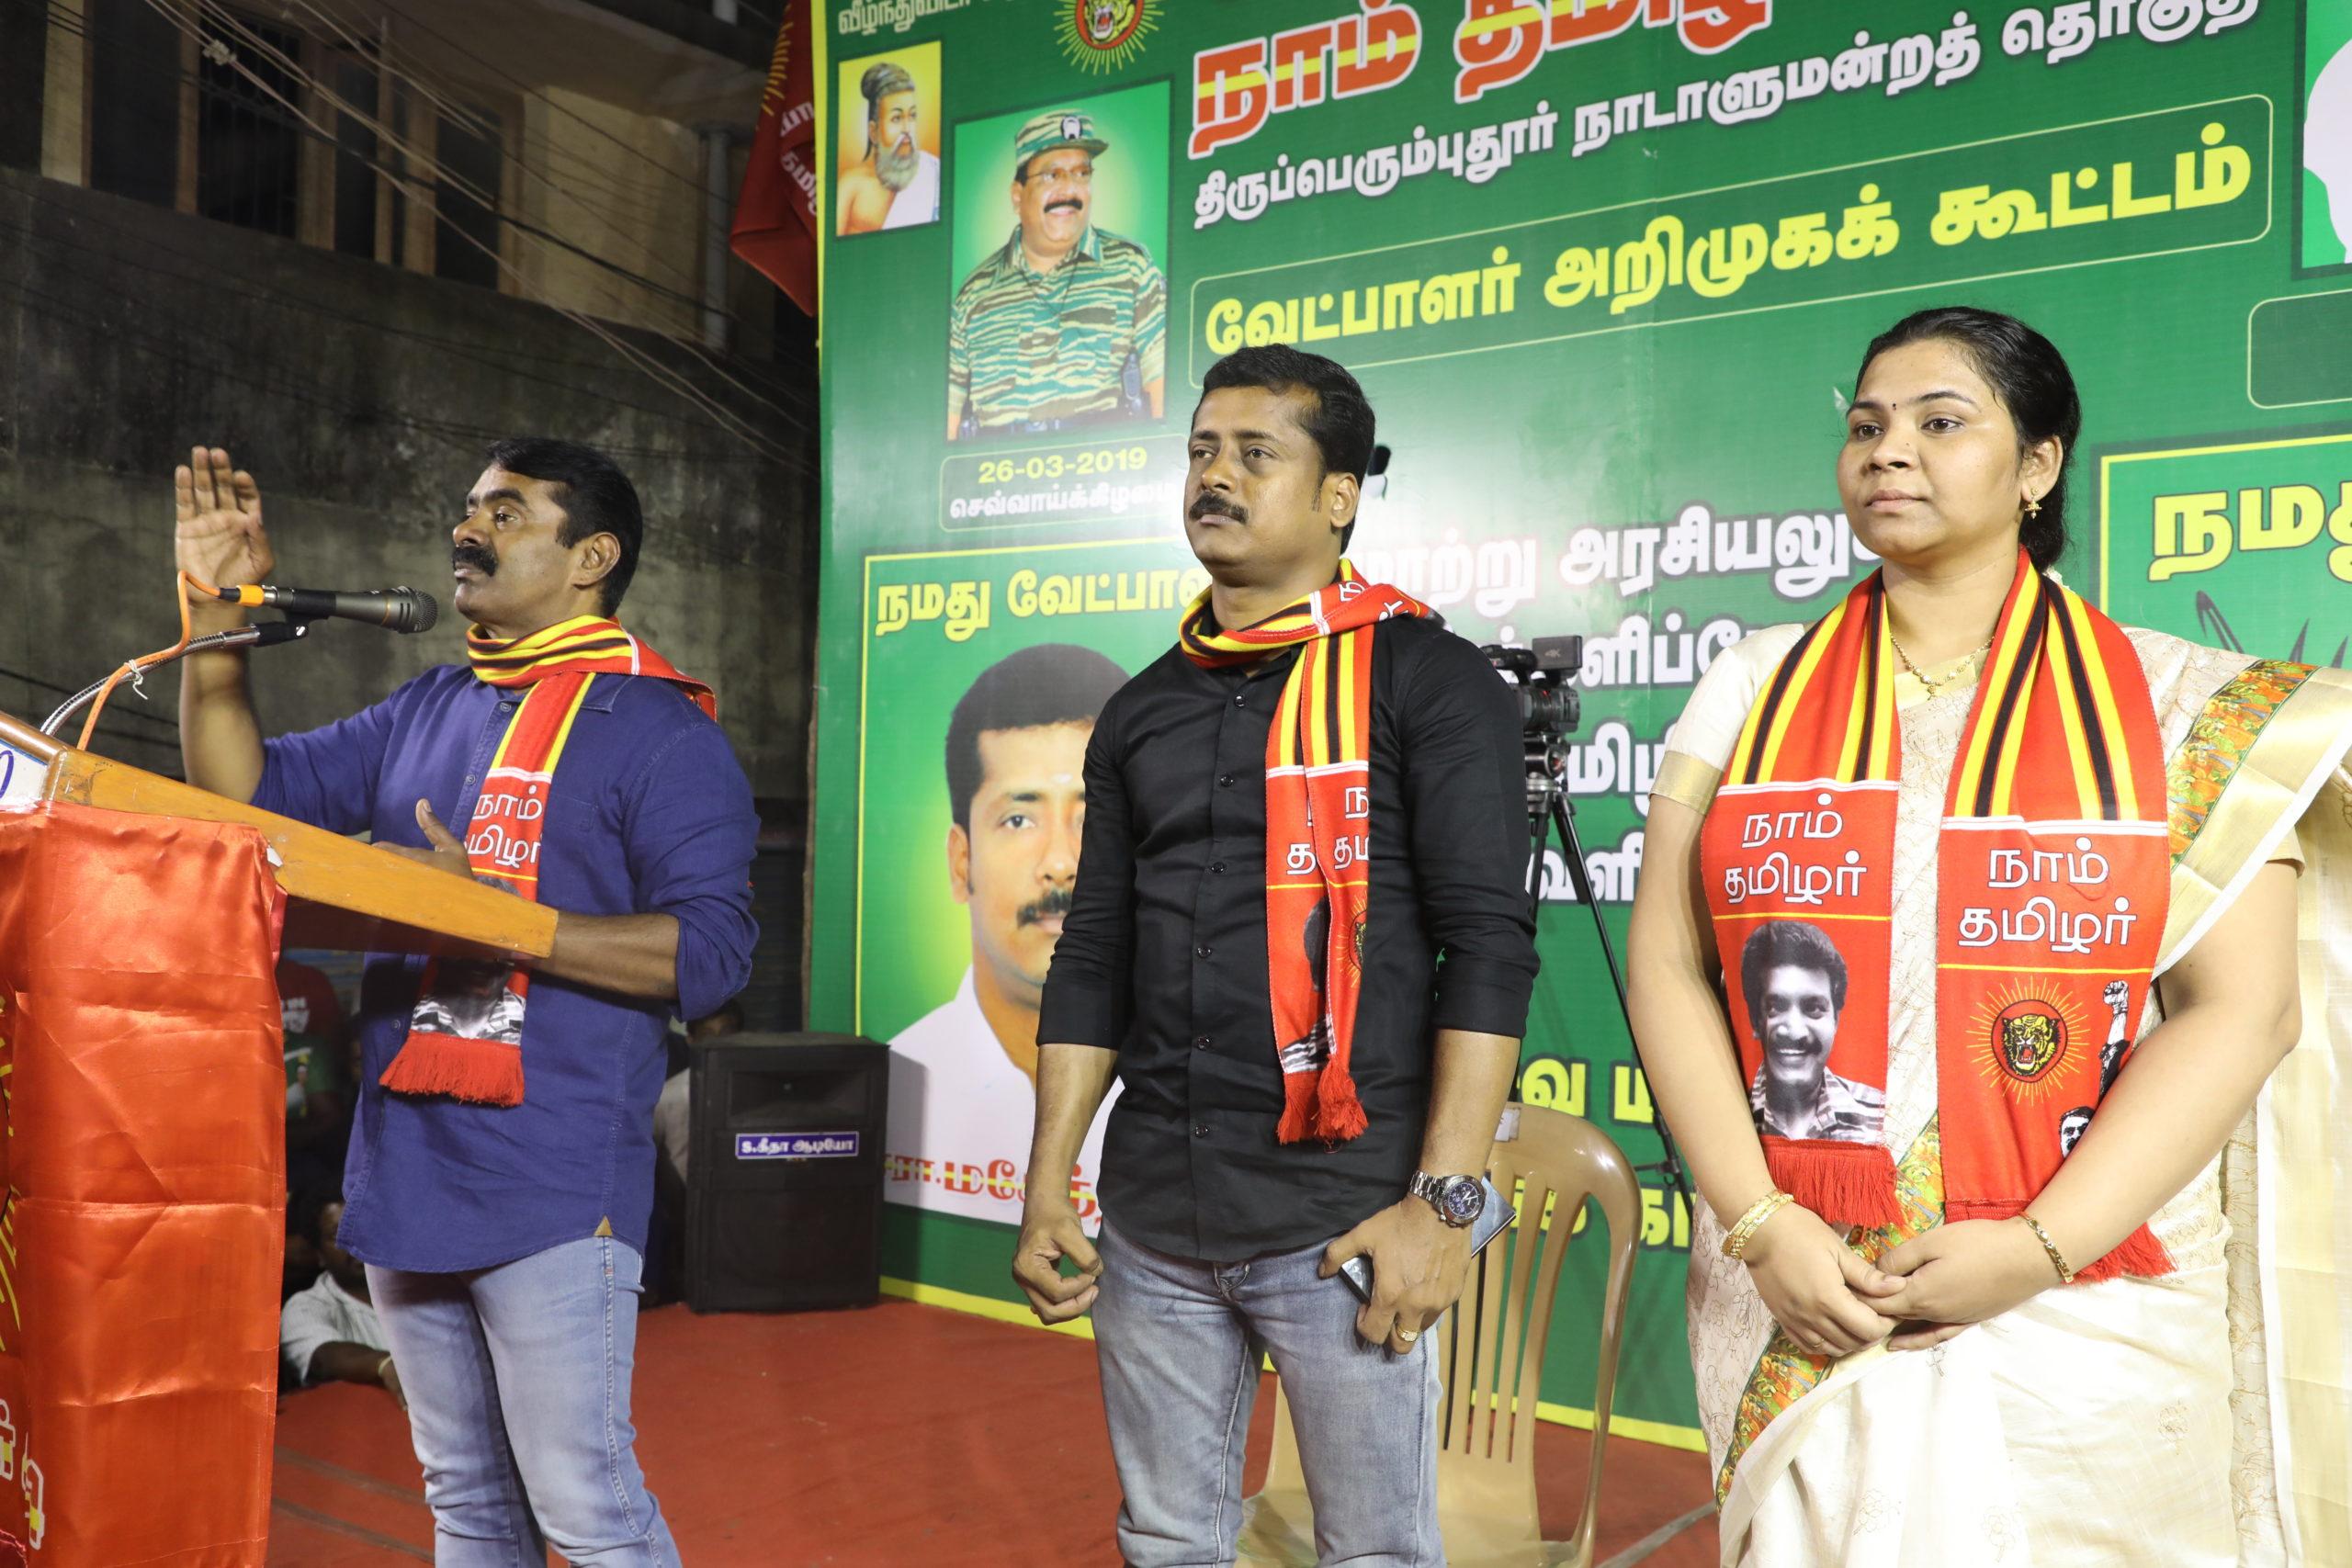 kanjipuram-sriperumputhur-mp-election-seeman-campaign-2019-3.jpg